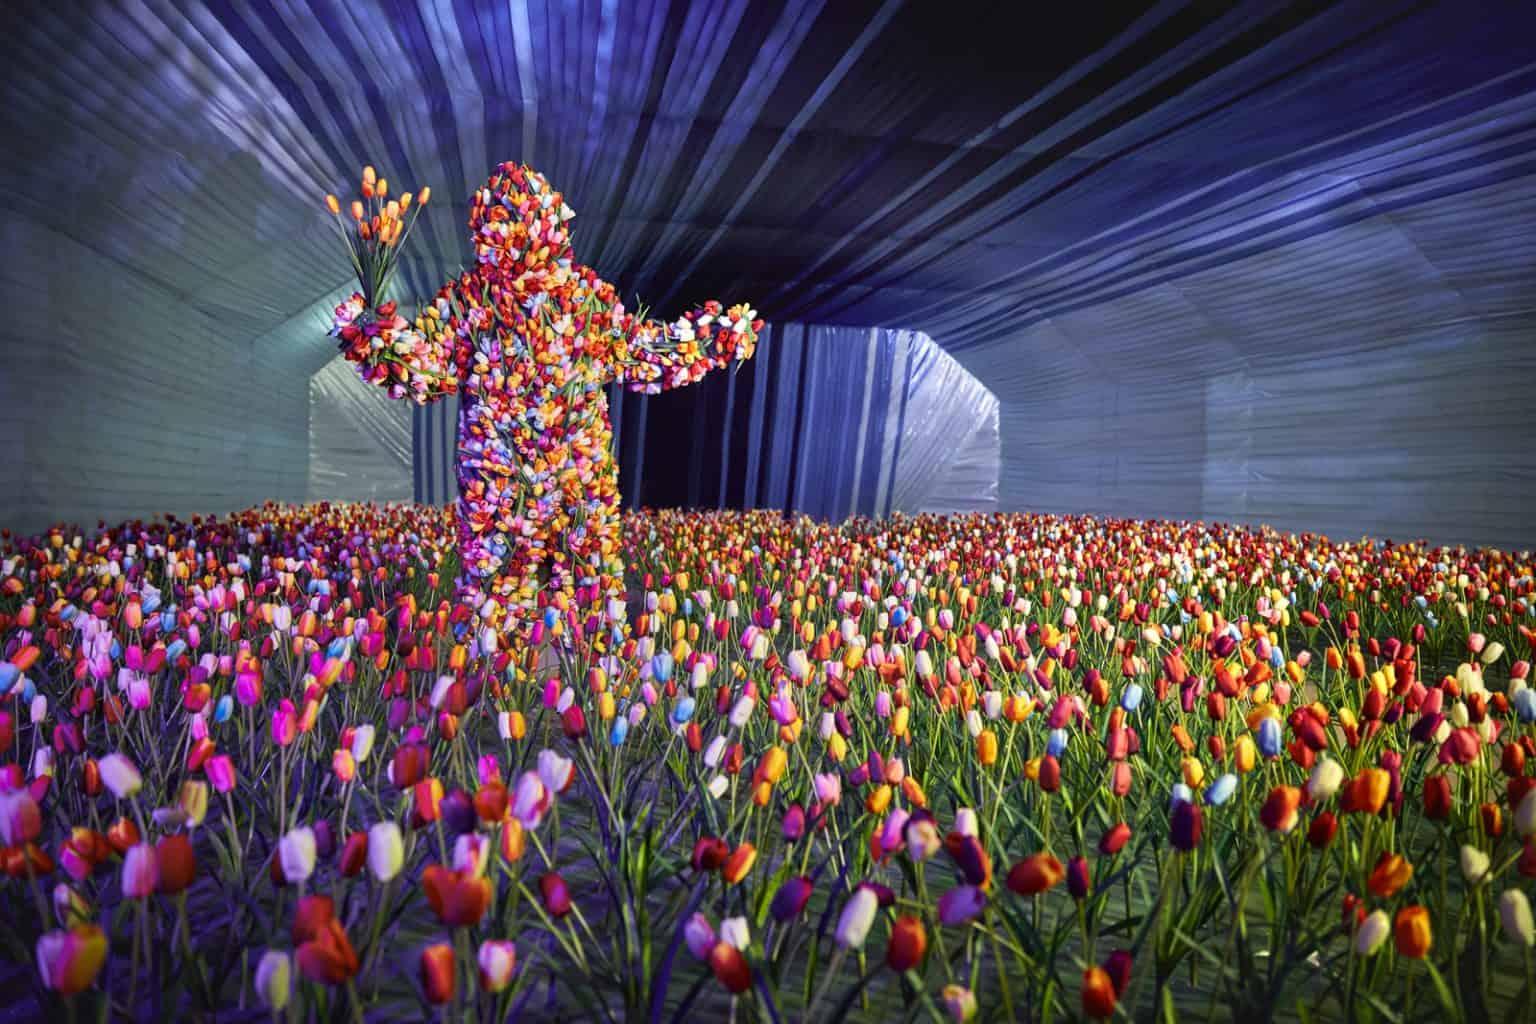 npp_easyjet_tulip-room_676-edit Vortex Events